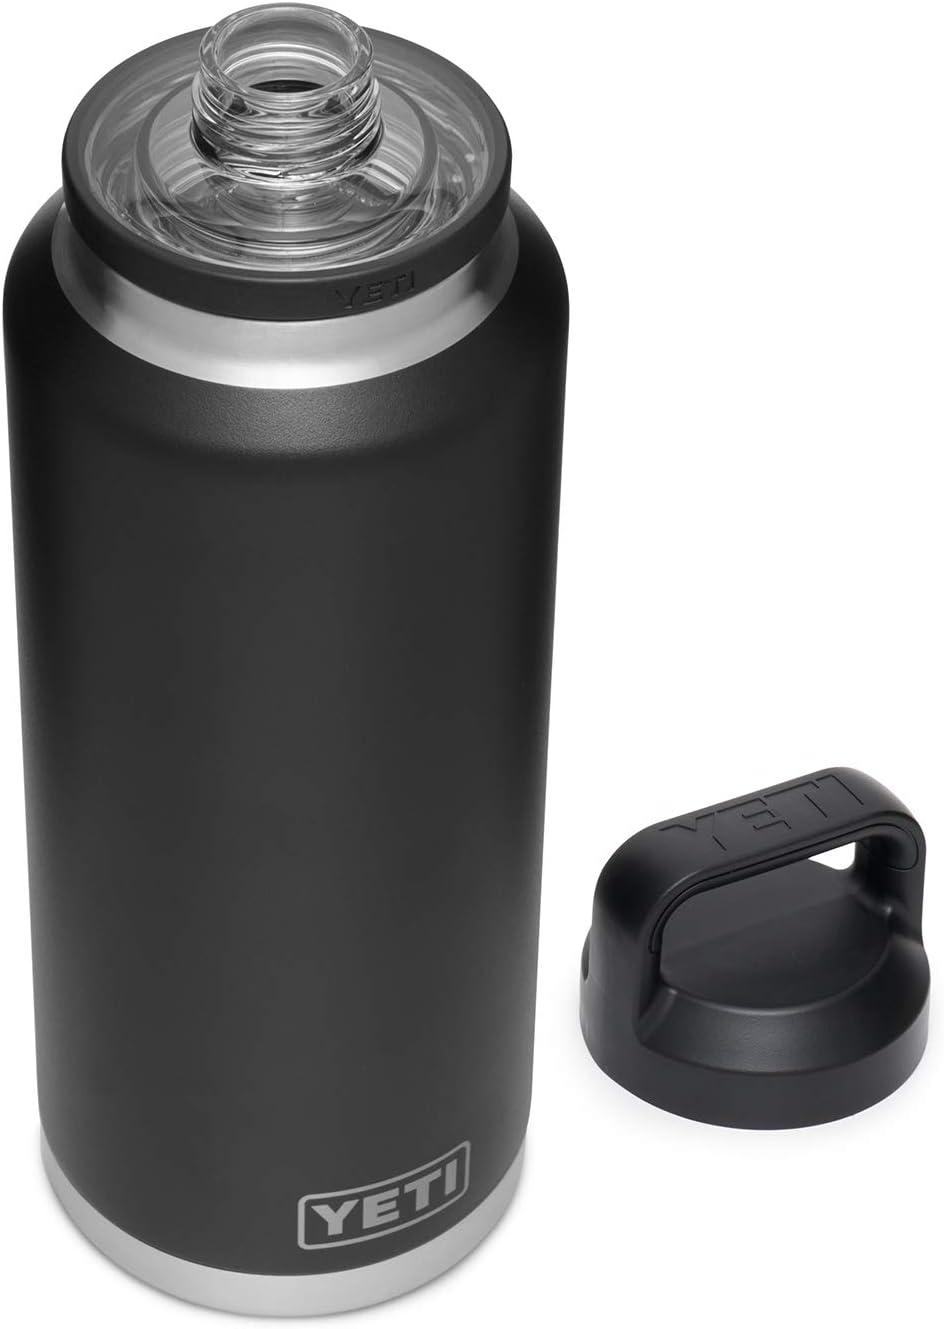 YETI Rambler 46 oz Bottle, Vacuum Insulated, Stainless Steel with Chug Cap, Black